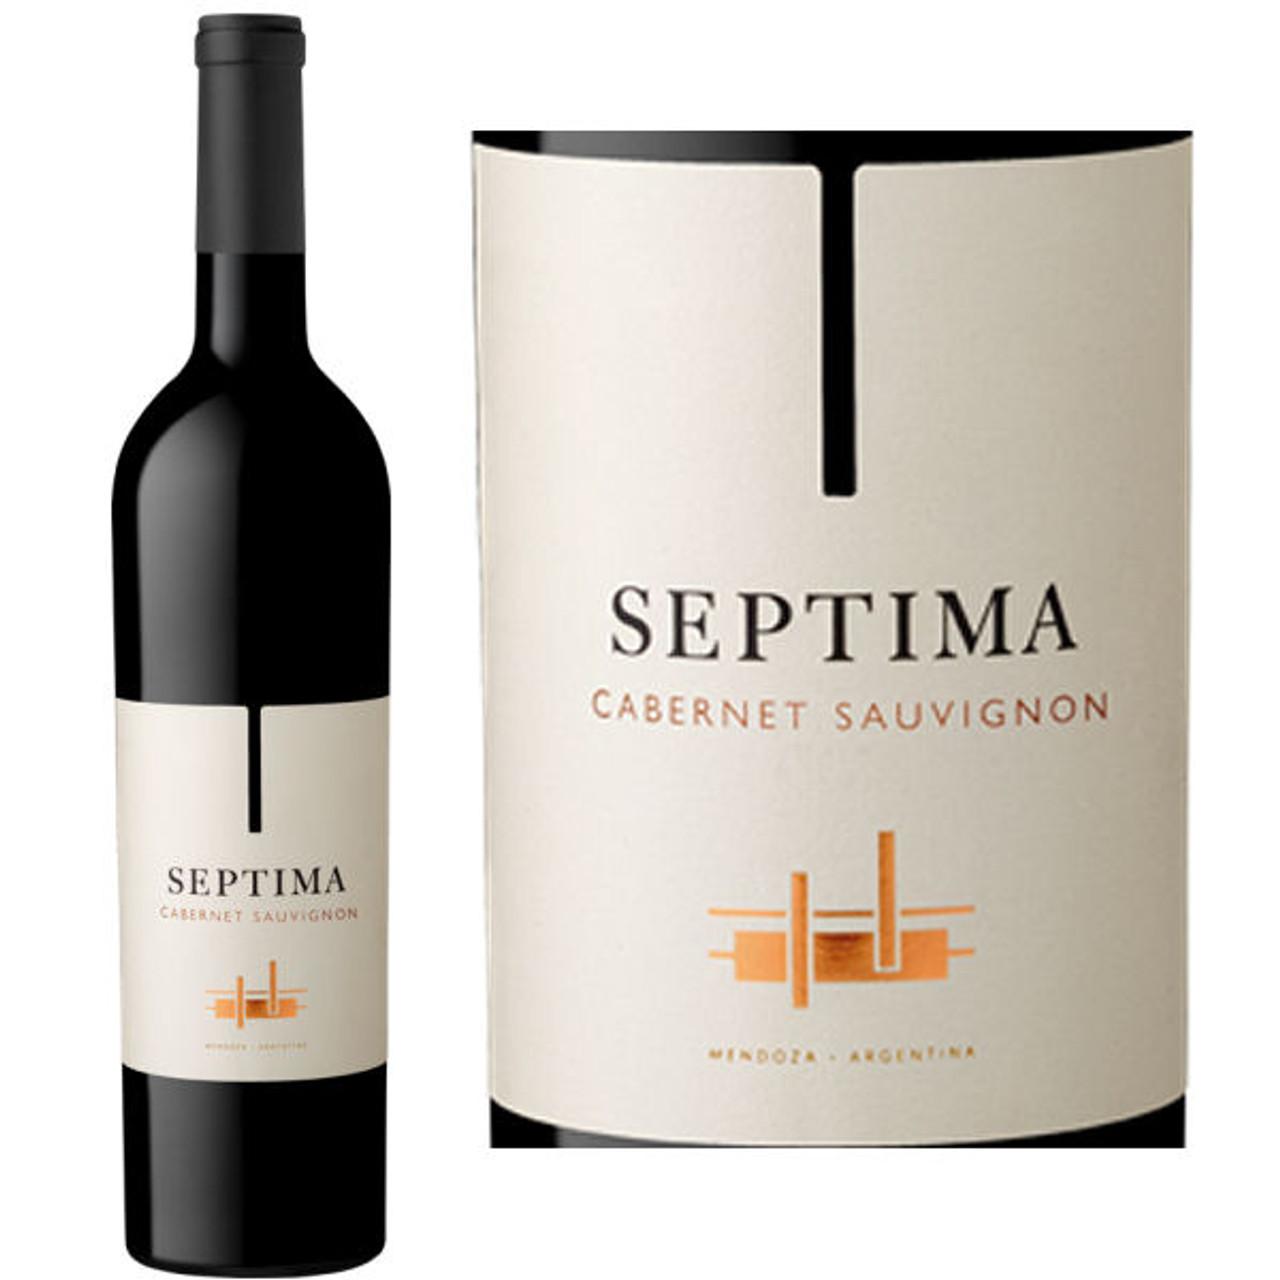 Septima Mendoza Cabernet